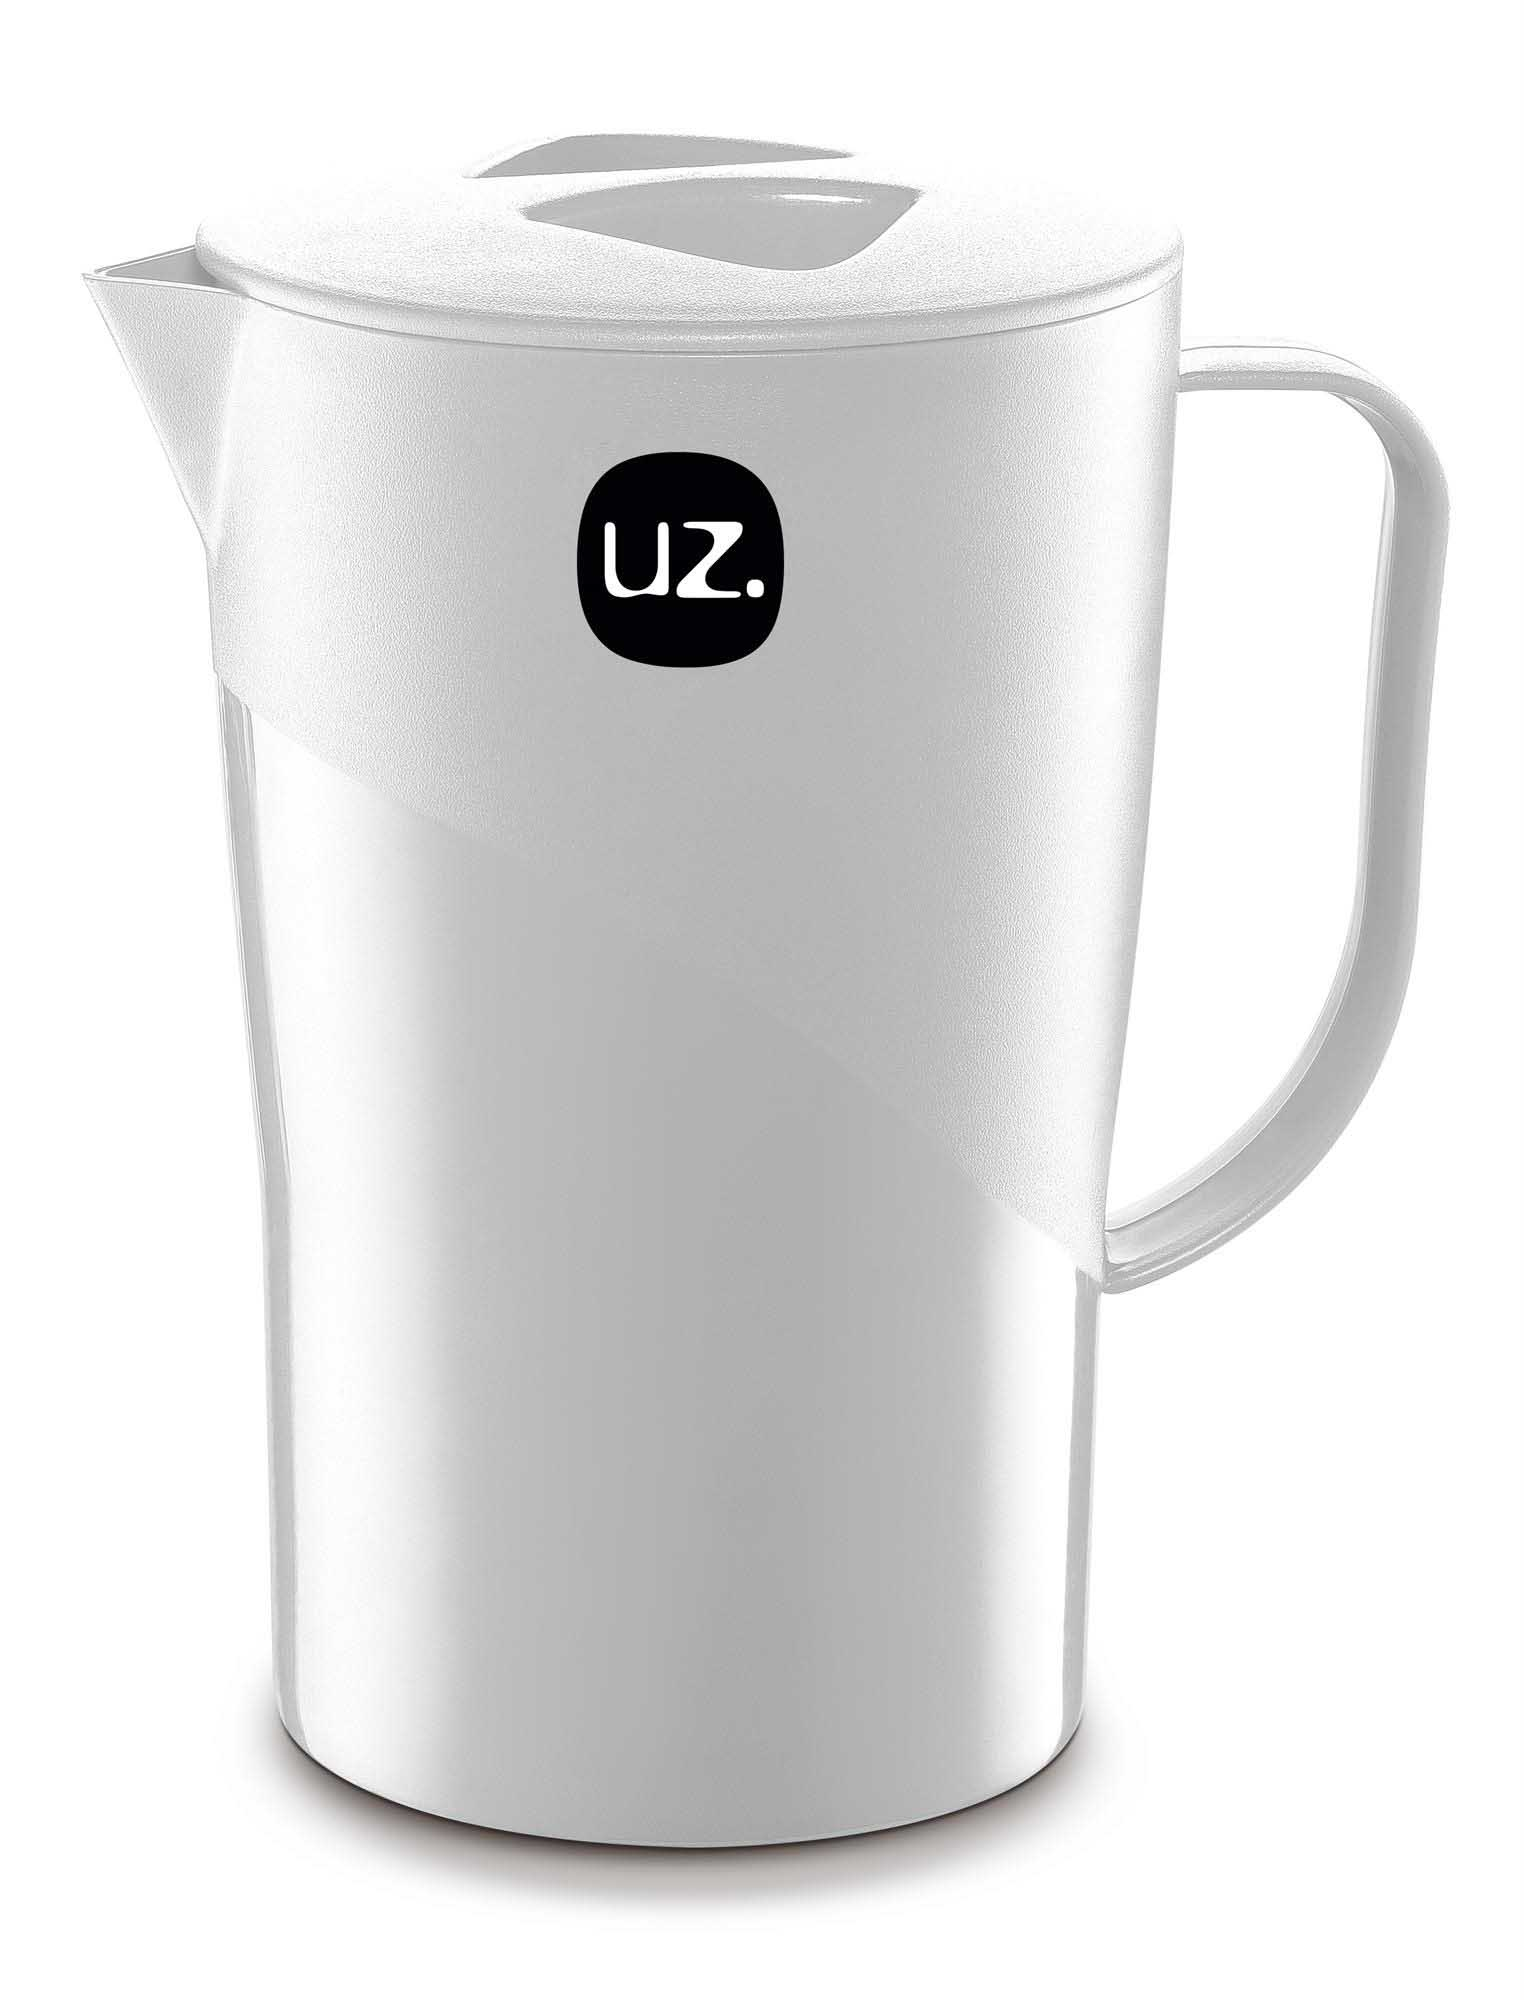 Jarra 2,0 Litros Solido Liso UZ - Branco